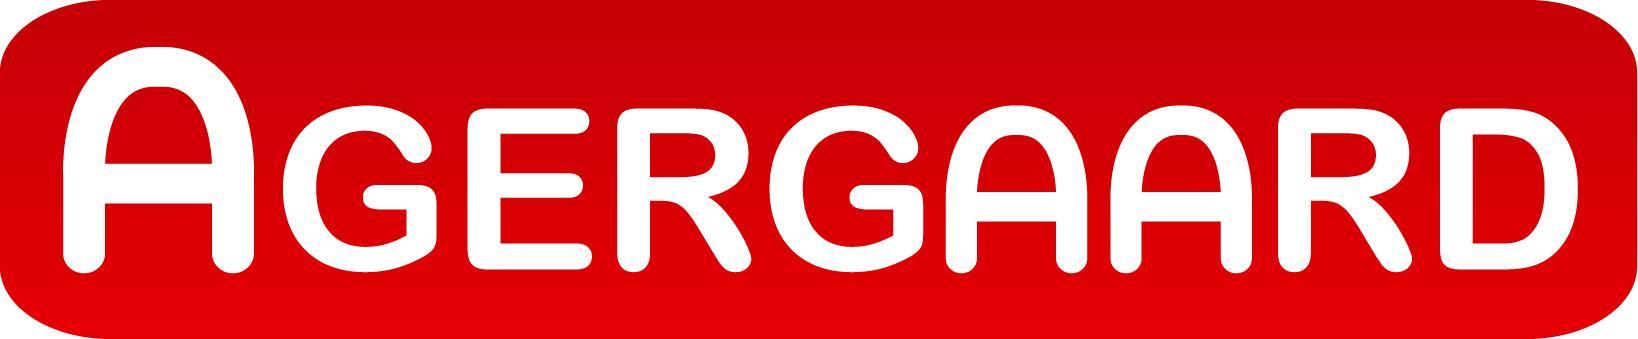 O.C. Agergaard GmbH